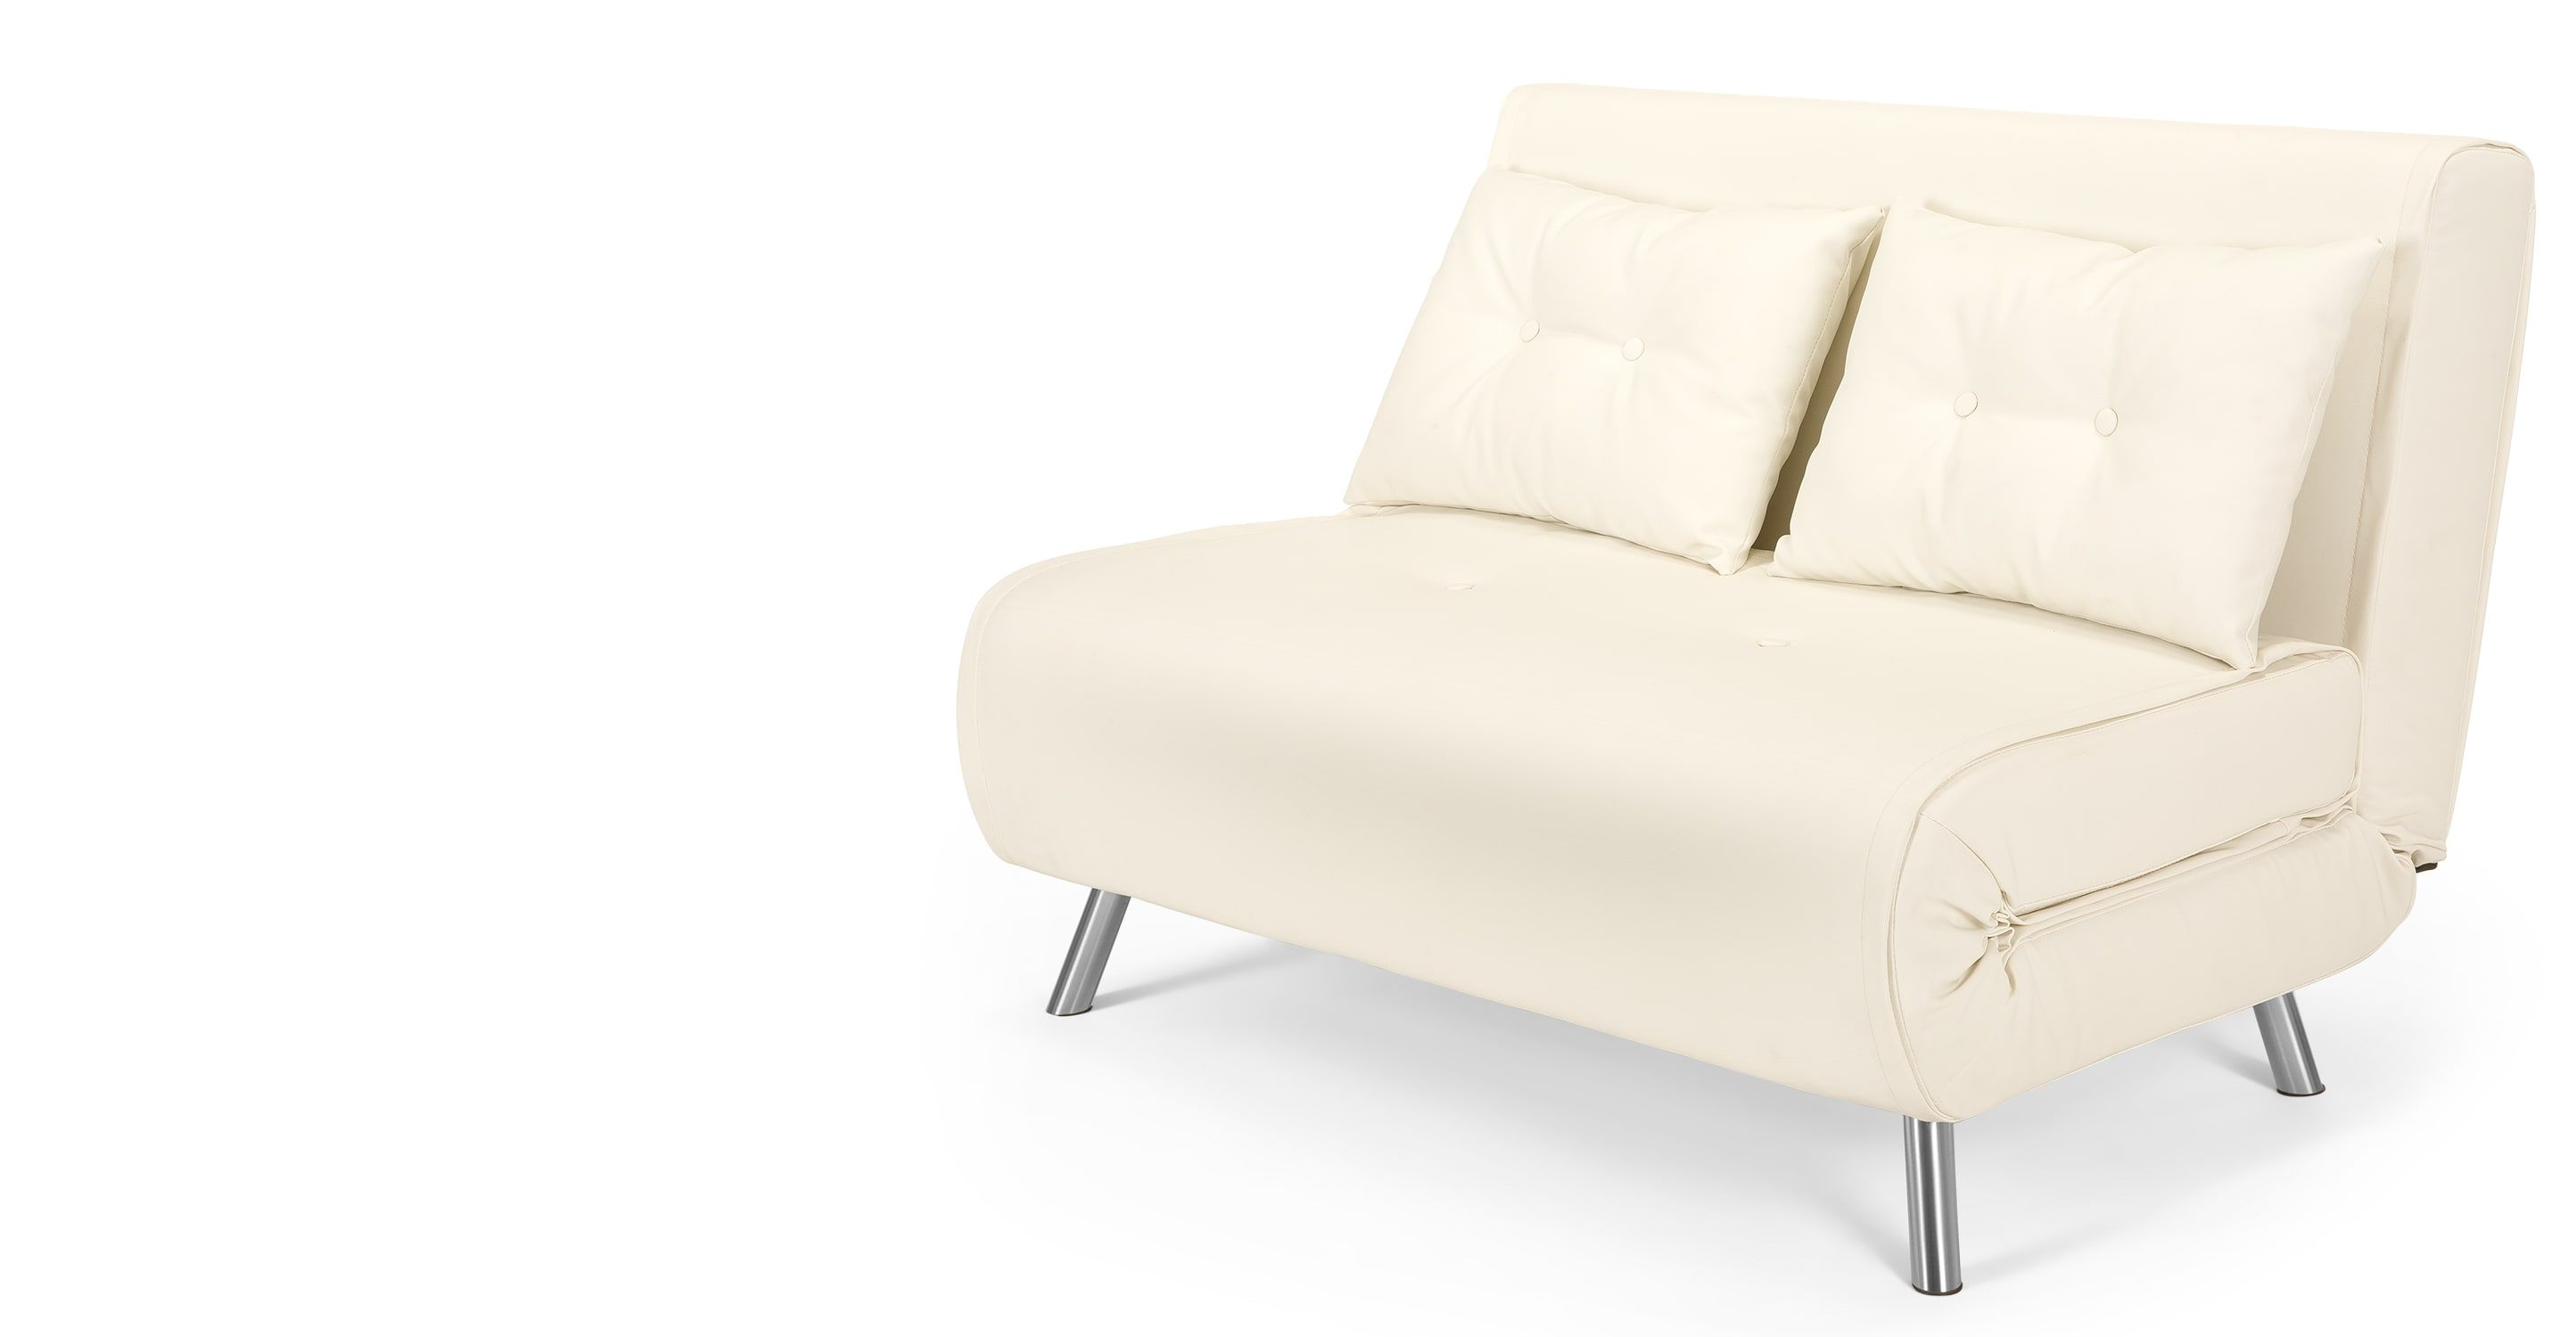 Knislinge Sofa Review Black Microfiber Small Sectional With Reversible Chaise Ottoman Kleine Couch Hallo Neues Von Sitzfeldt Ein Bericht